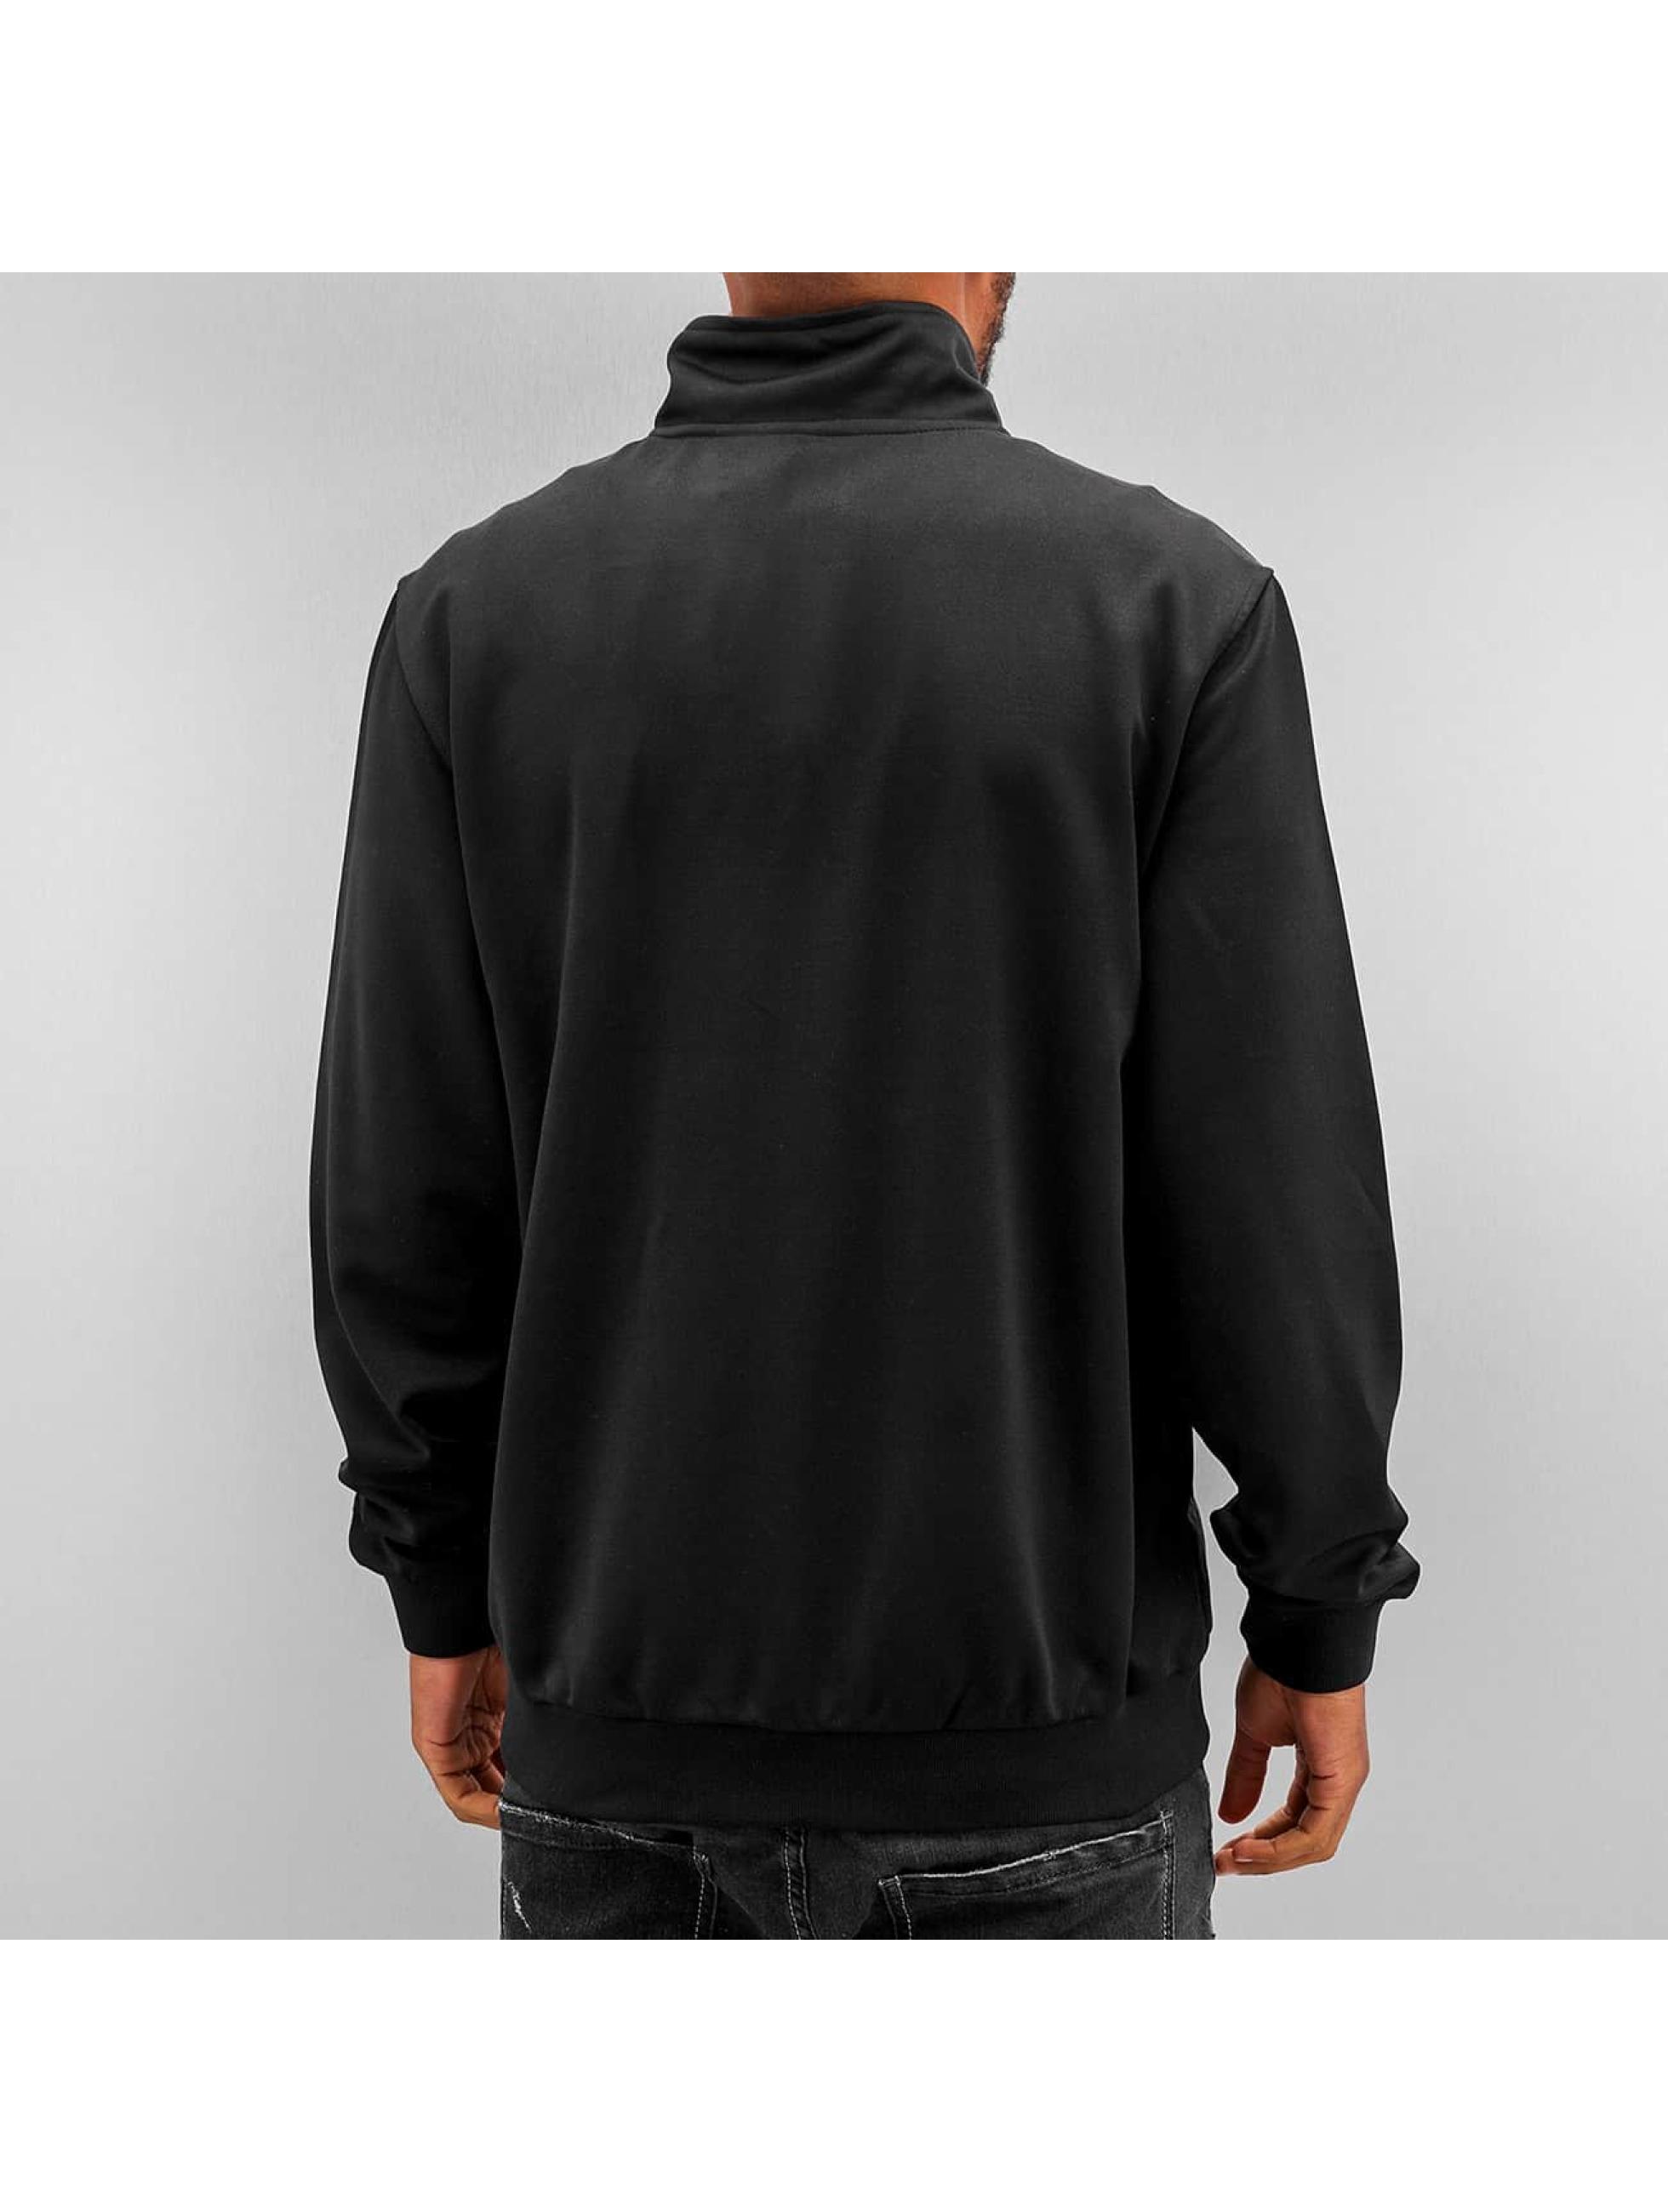 Pelle Pelle Transitional Jackets Icon Plate svart